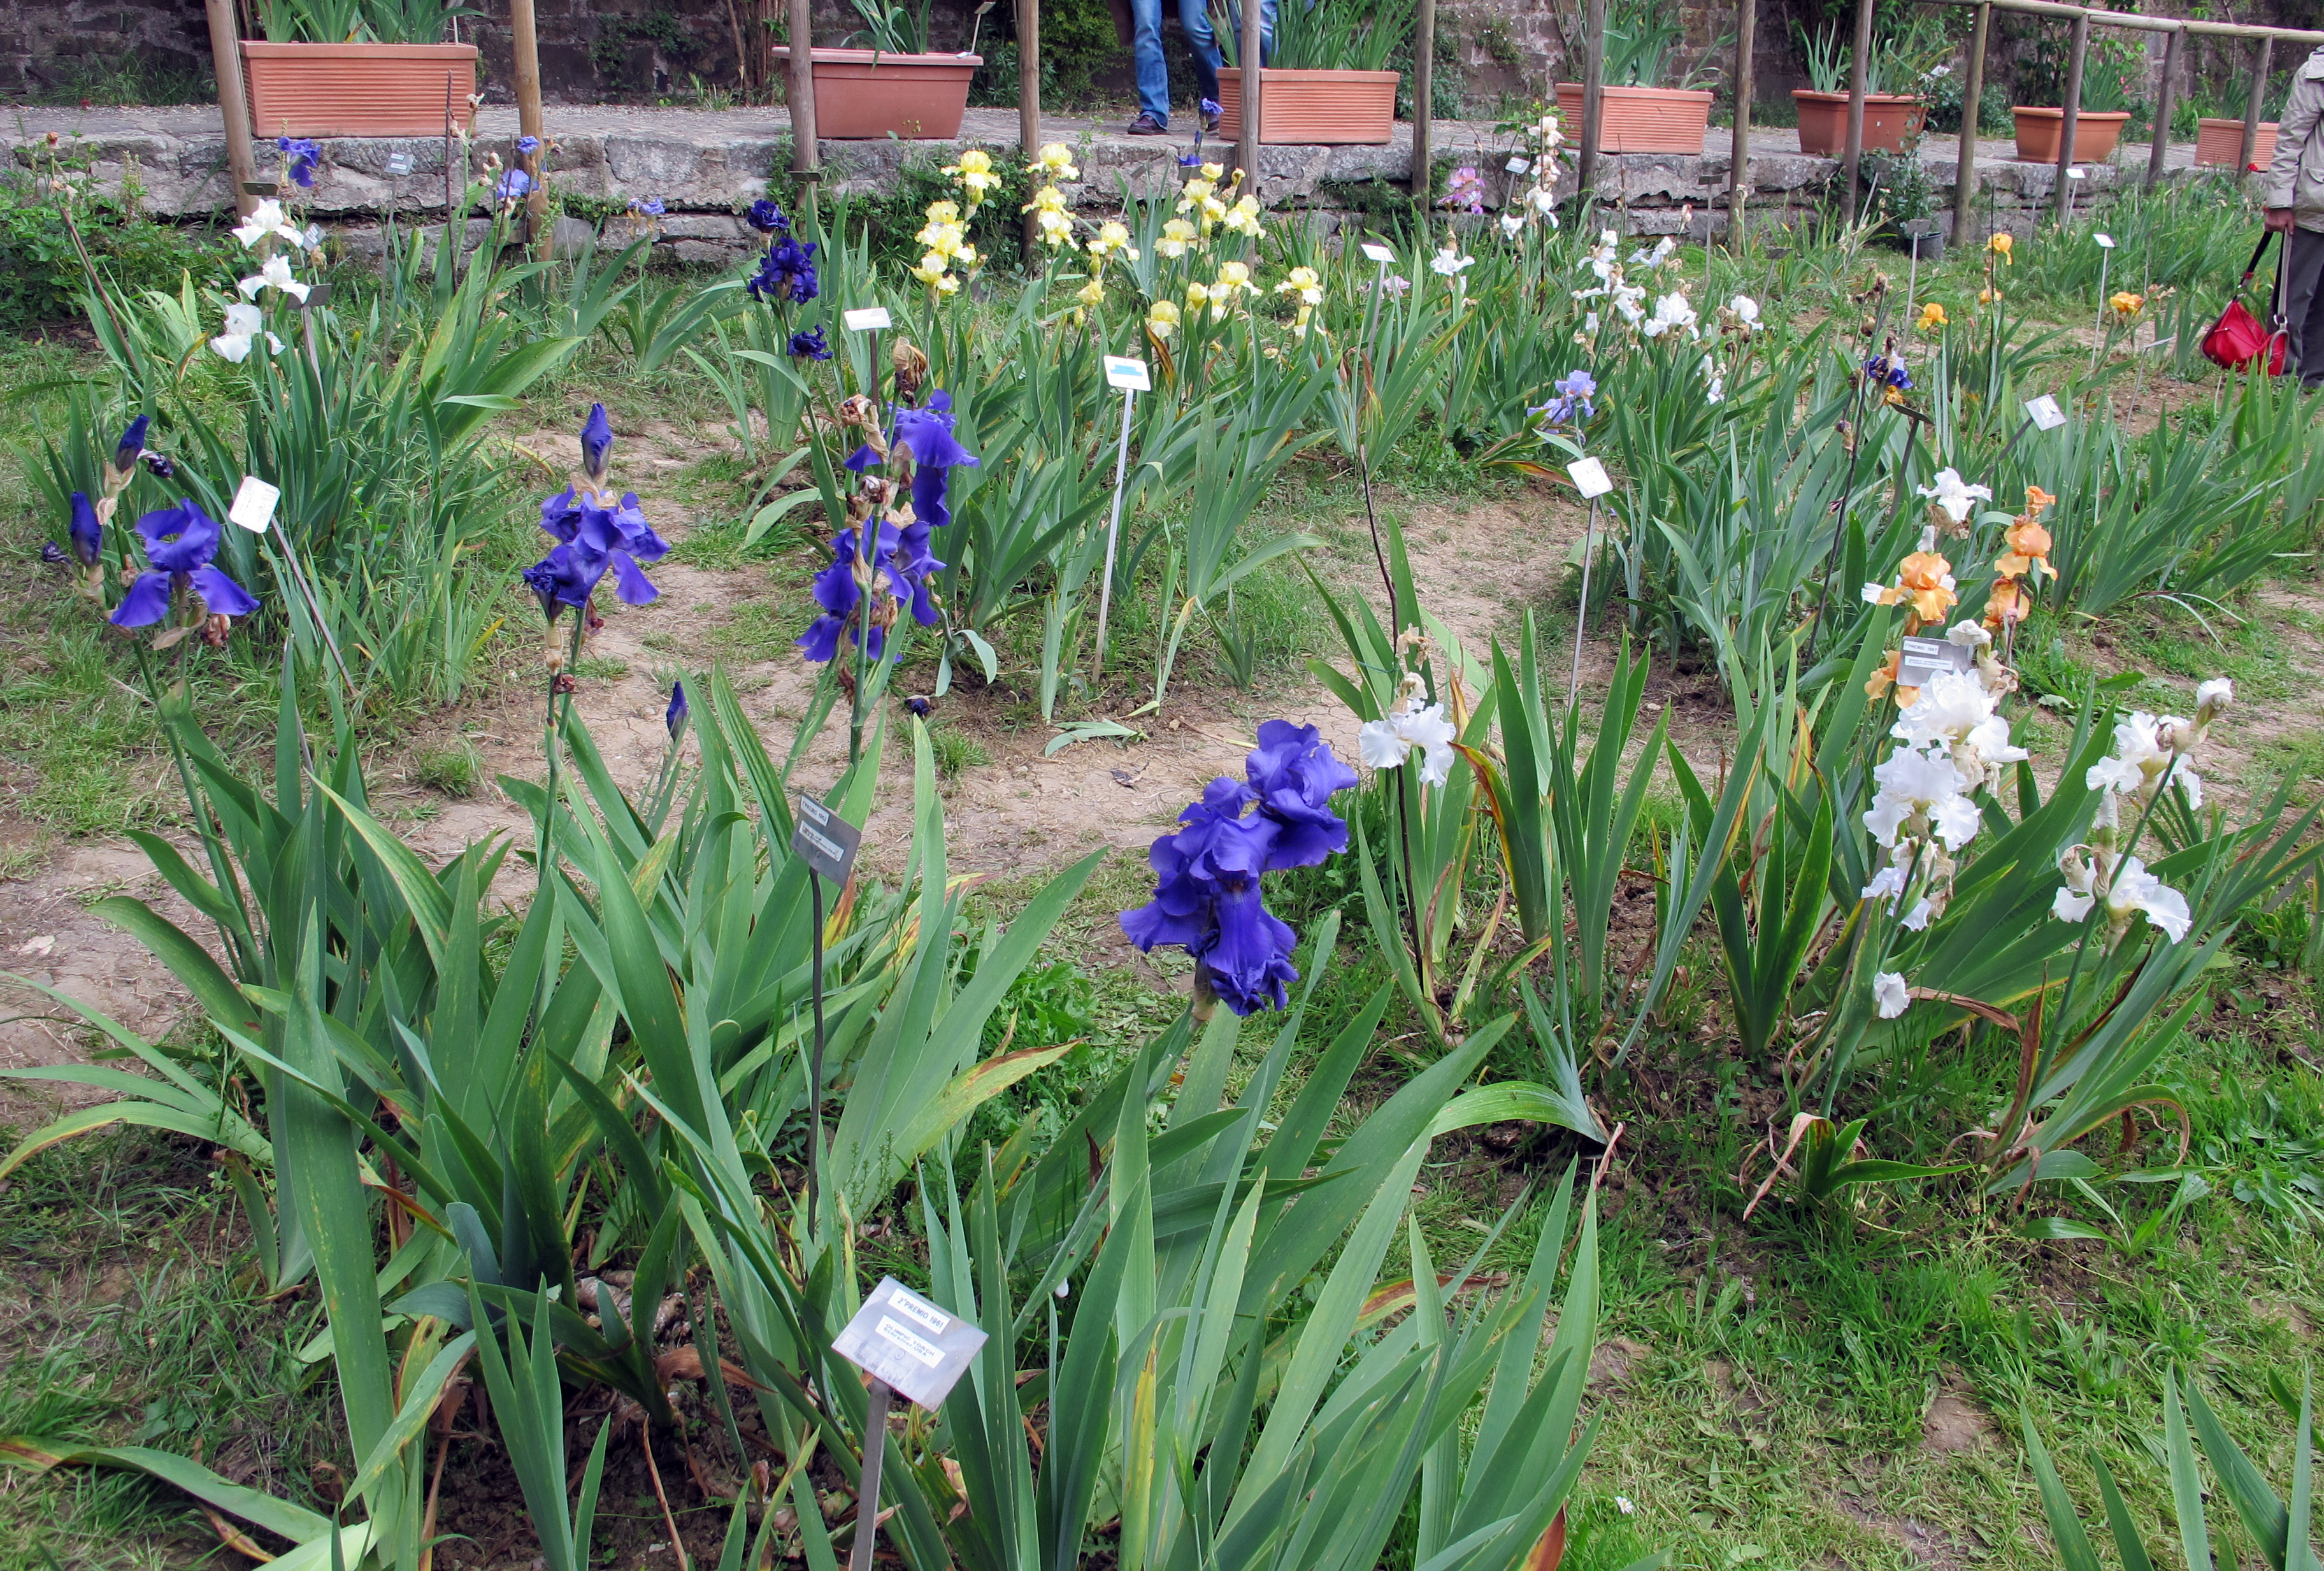 File giardino dell 39 iris firenze 2014 02 jpg wikimedia - Giardino dell iris firenze ...